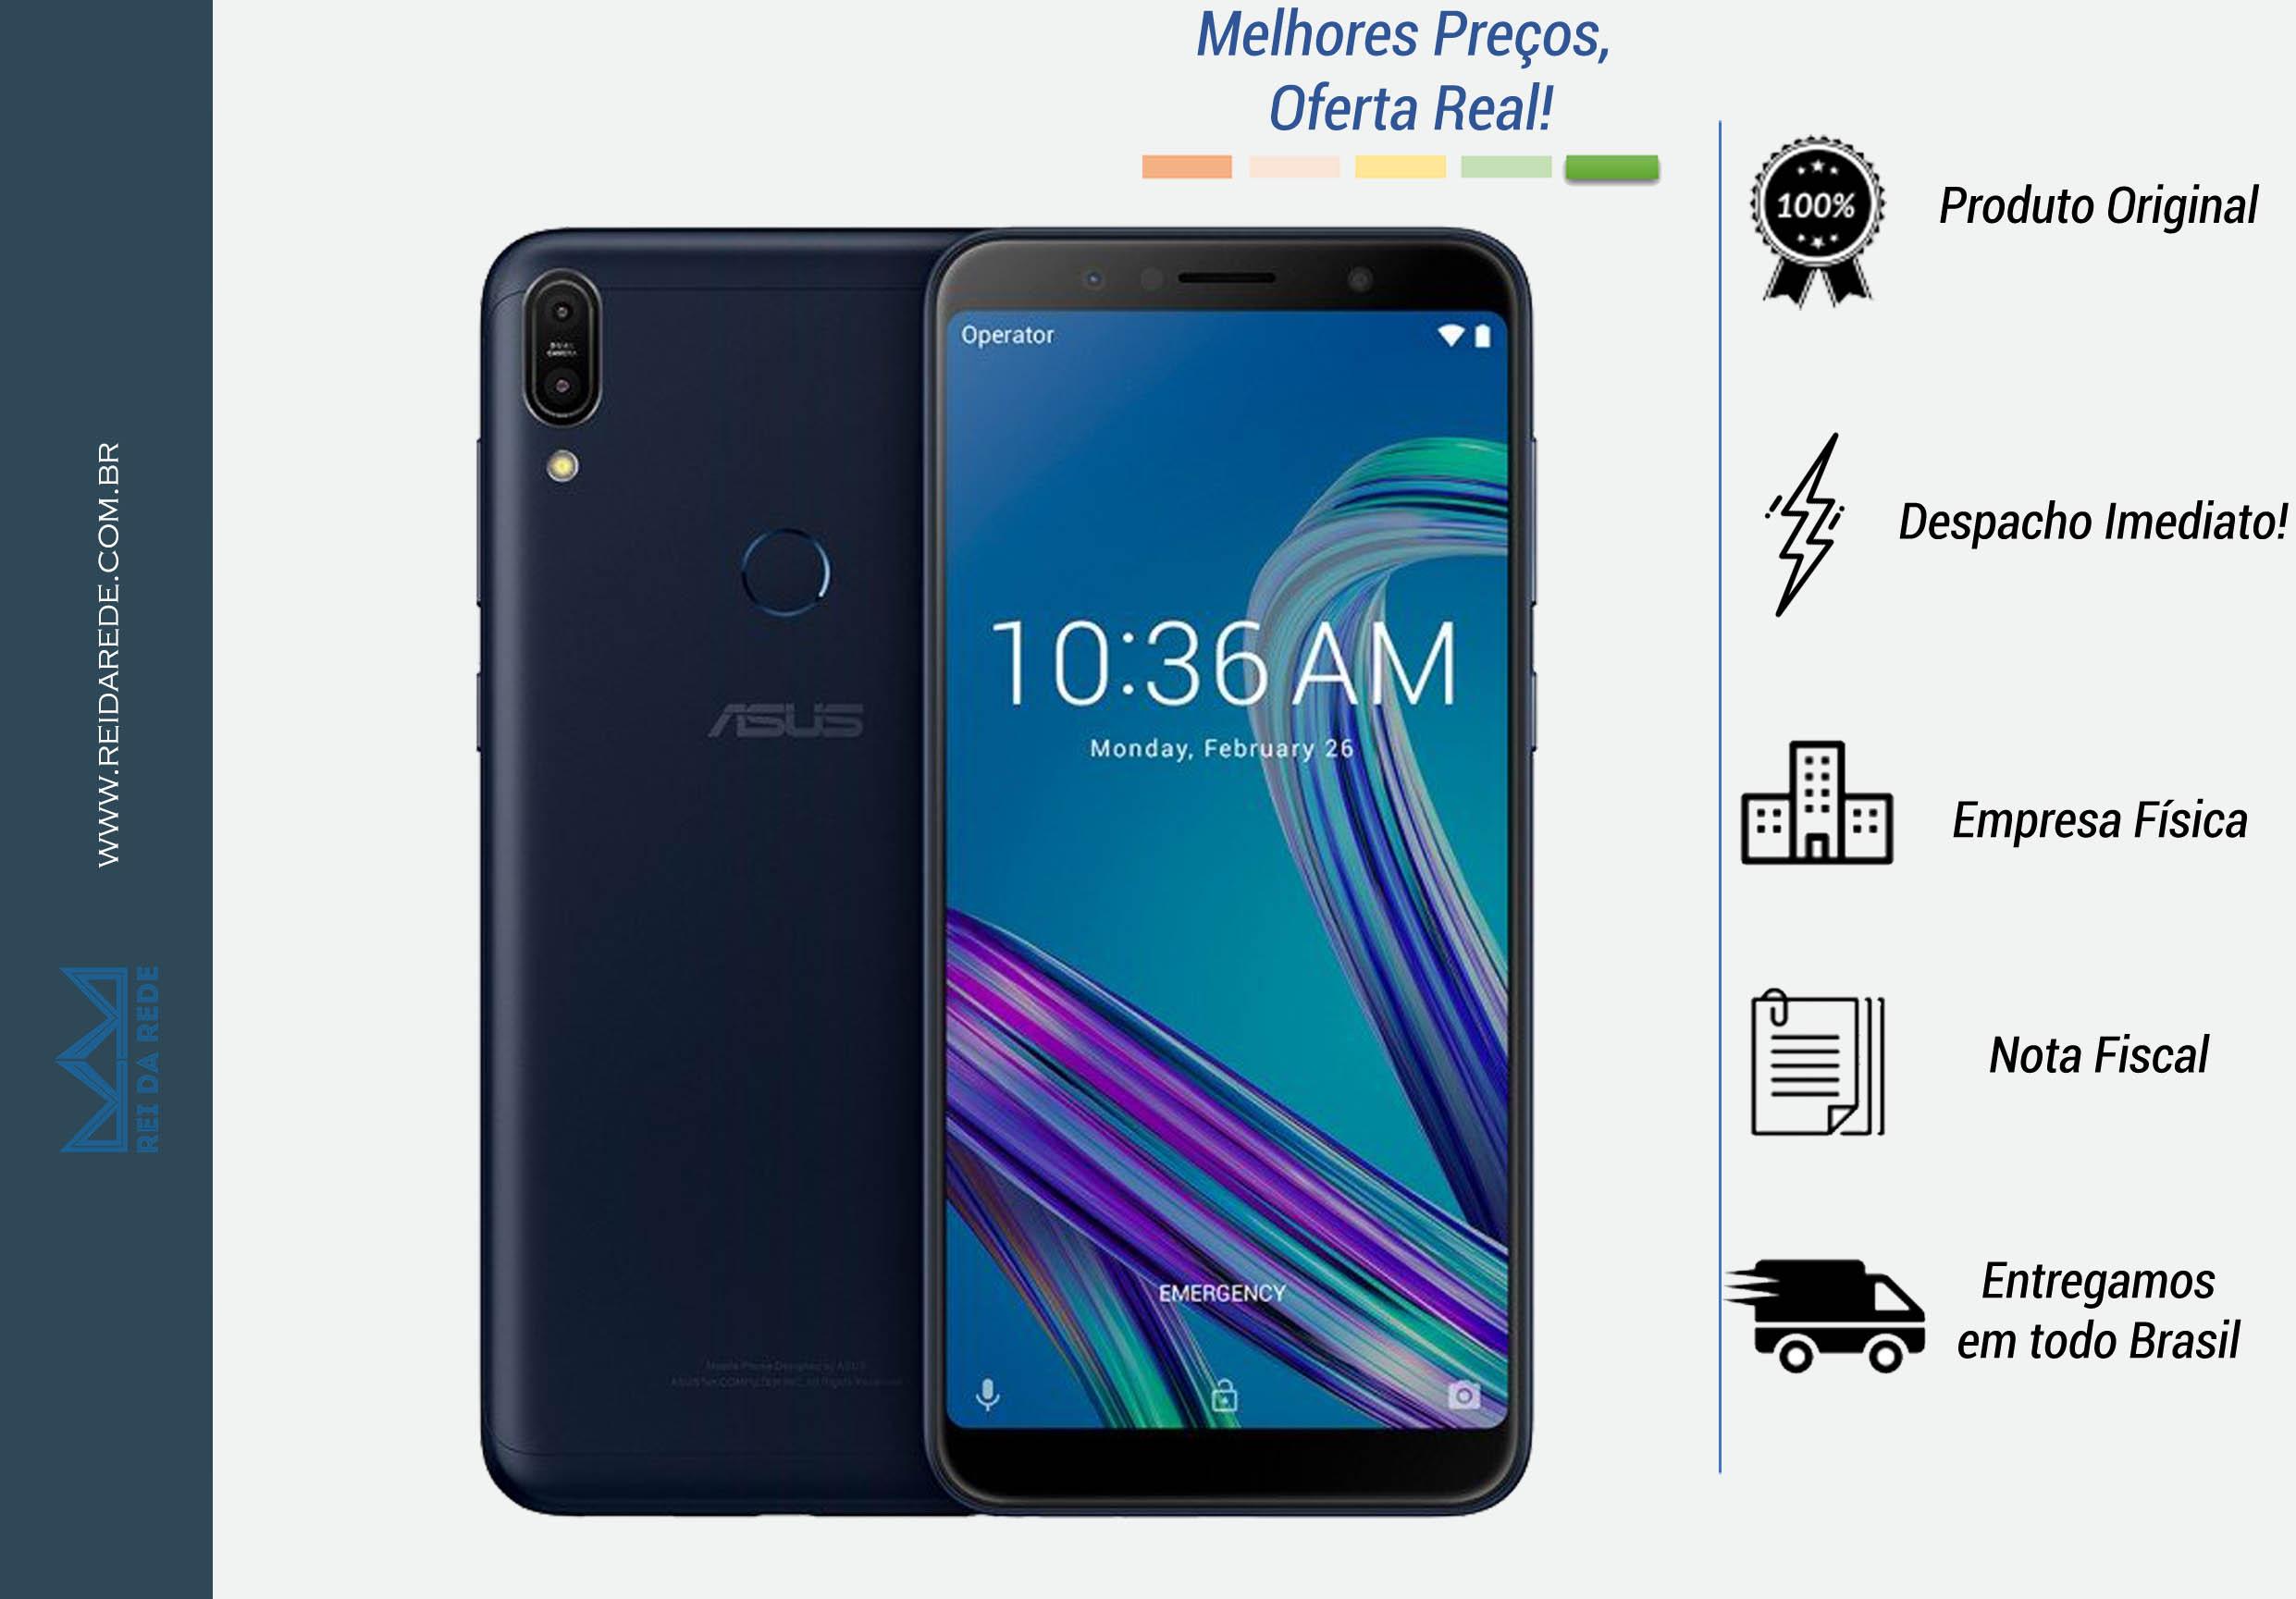 "SMARTPHONE ZENFONE MAX PRO M1 64GB QUALCOMM SDM636, TELA 6"", 4G, 64 GB CÂMERA DUAL 16MP + 5MP PRATA ZB602KL-4H137BR MARCA: ASUS - MODELO: ZENFONE MAX PRO M1 64GB"